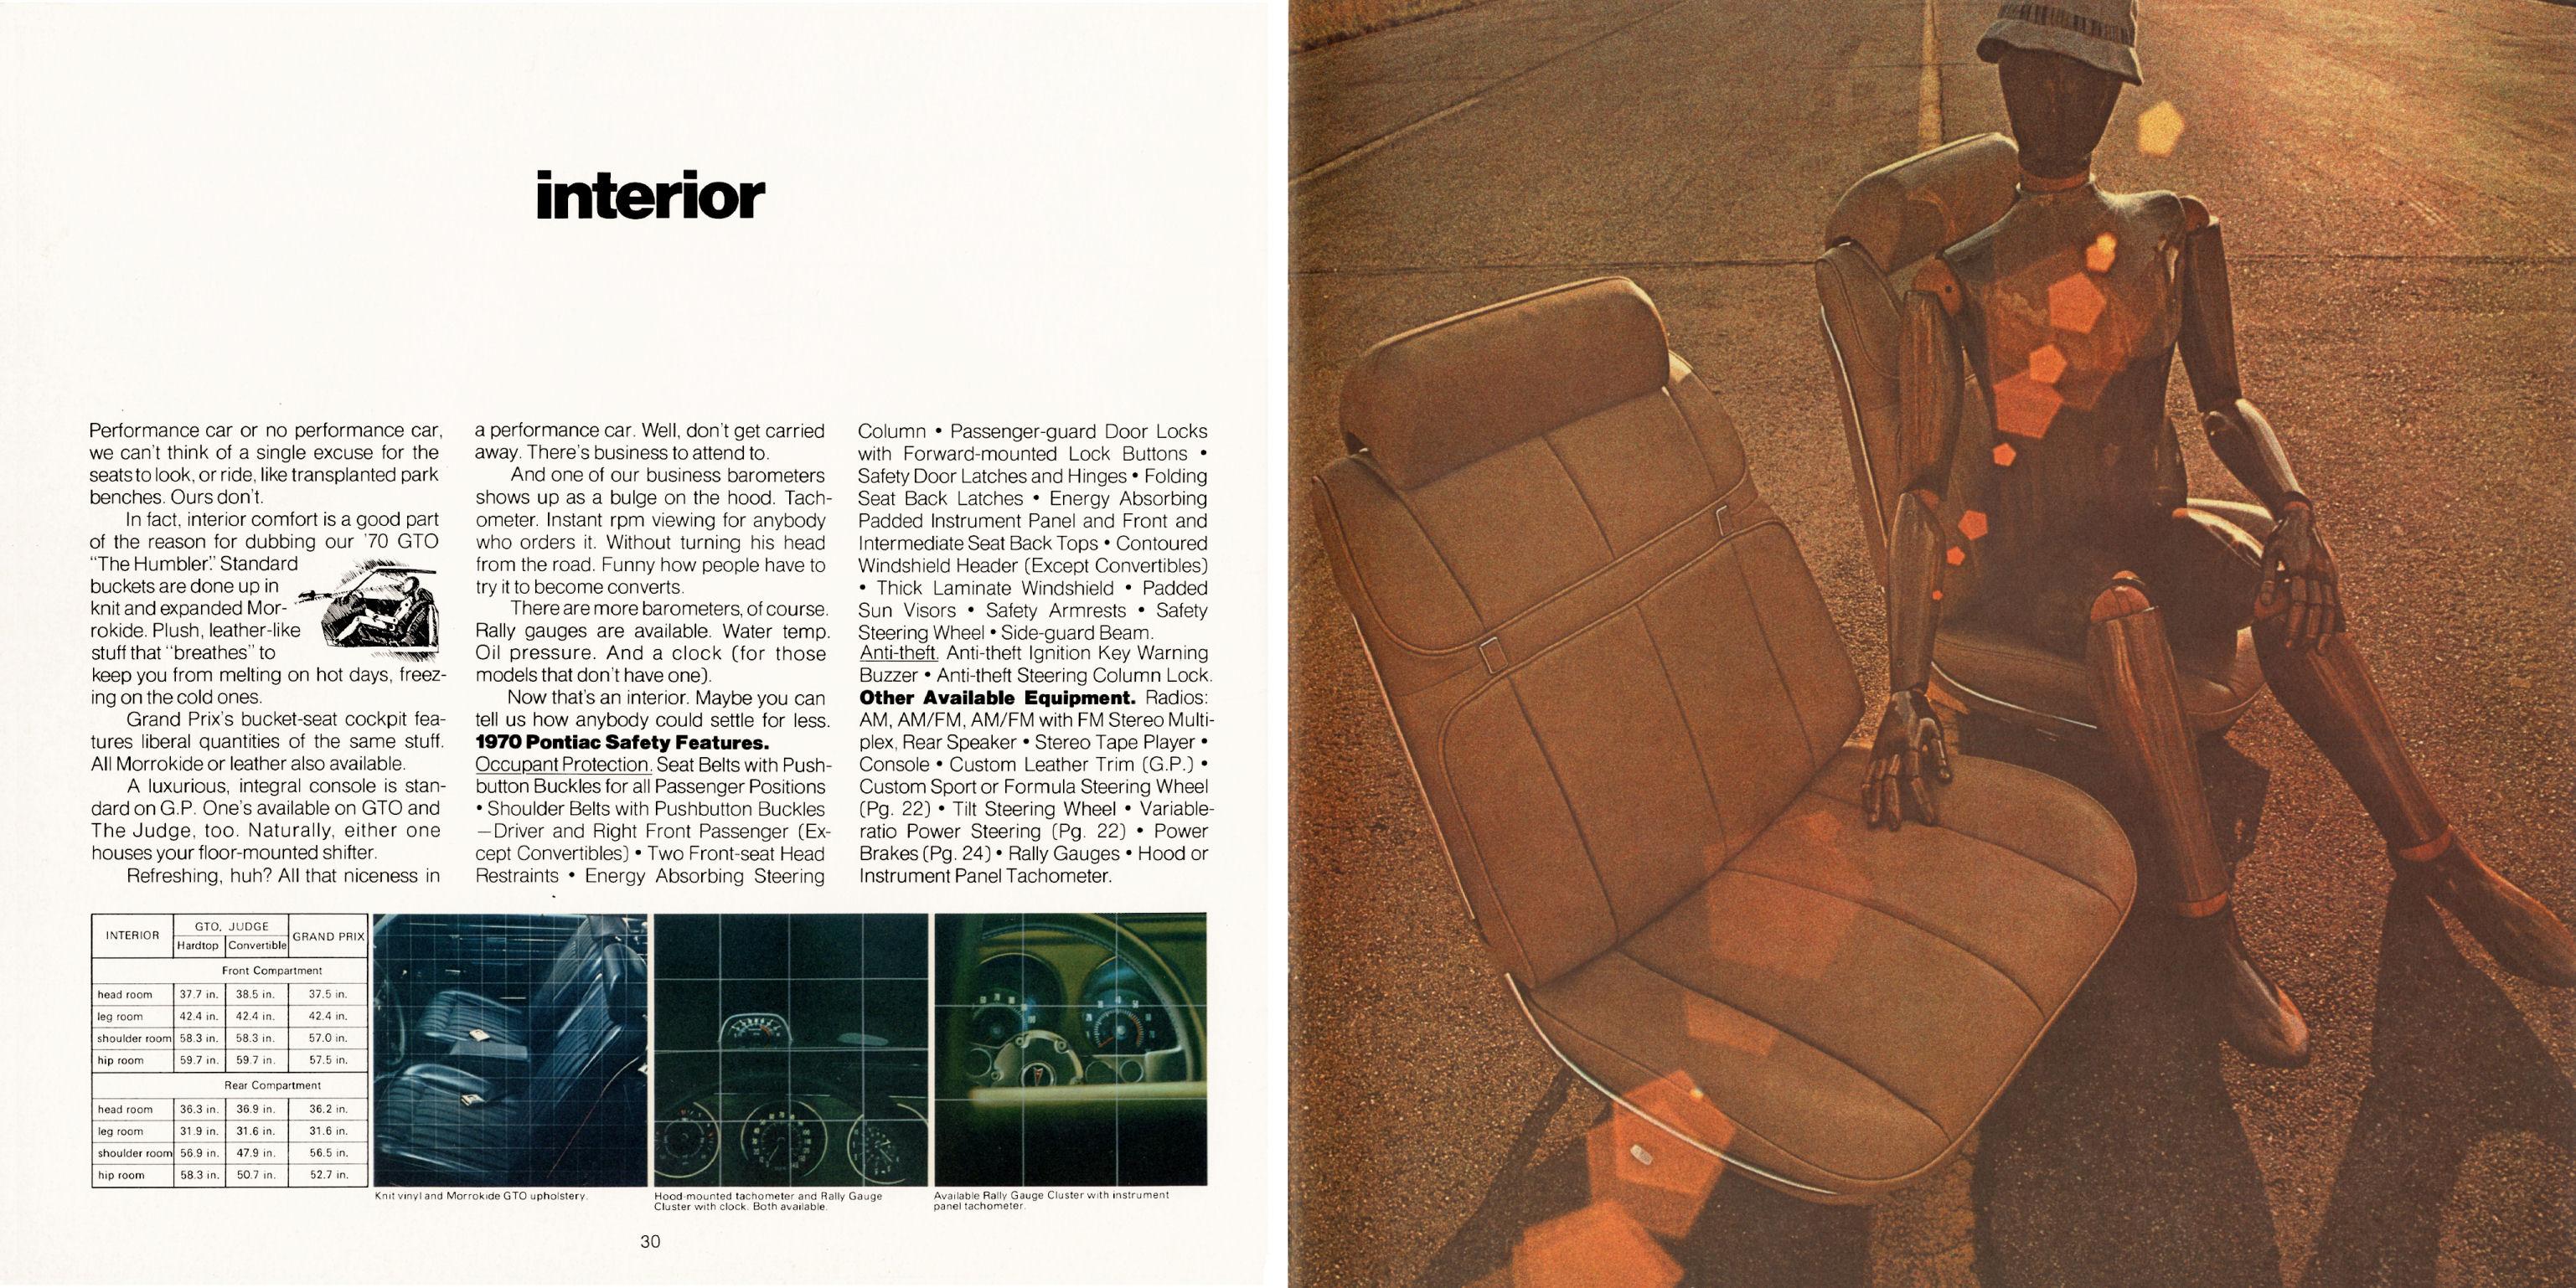 1970%20Pontiac%20Performance-30-31.jpg